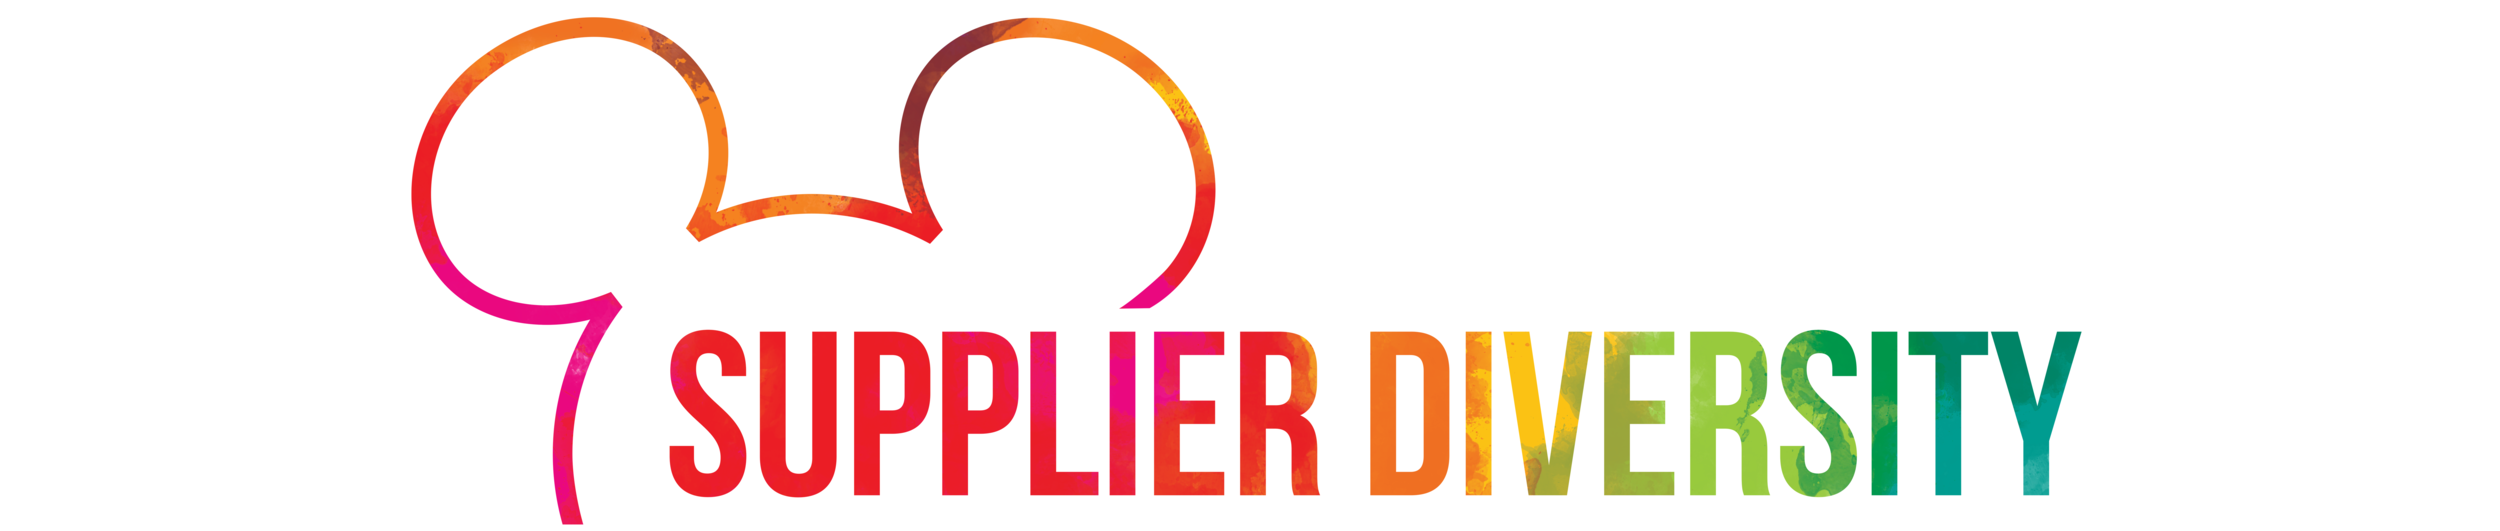 Disny Supplier Diversity Logo.png